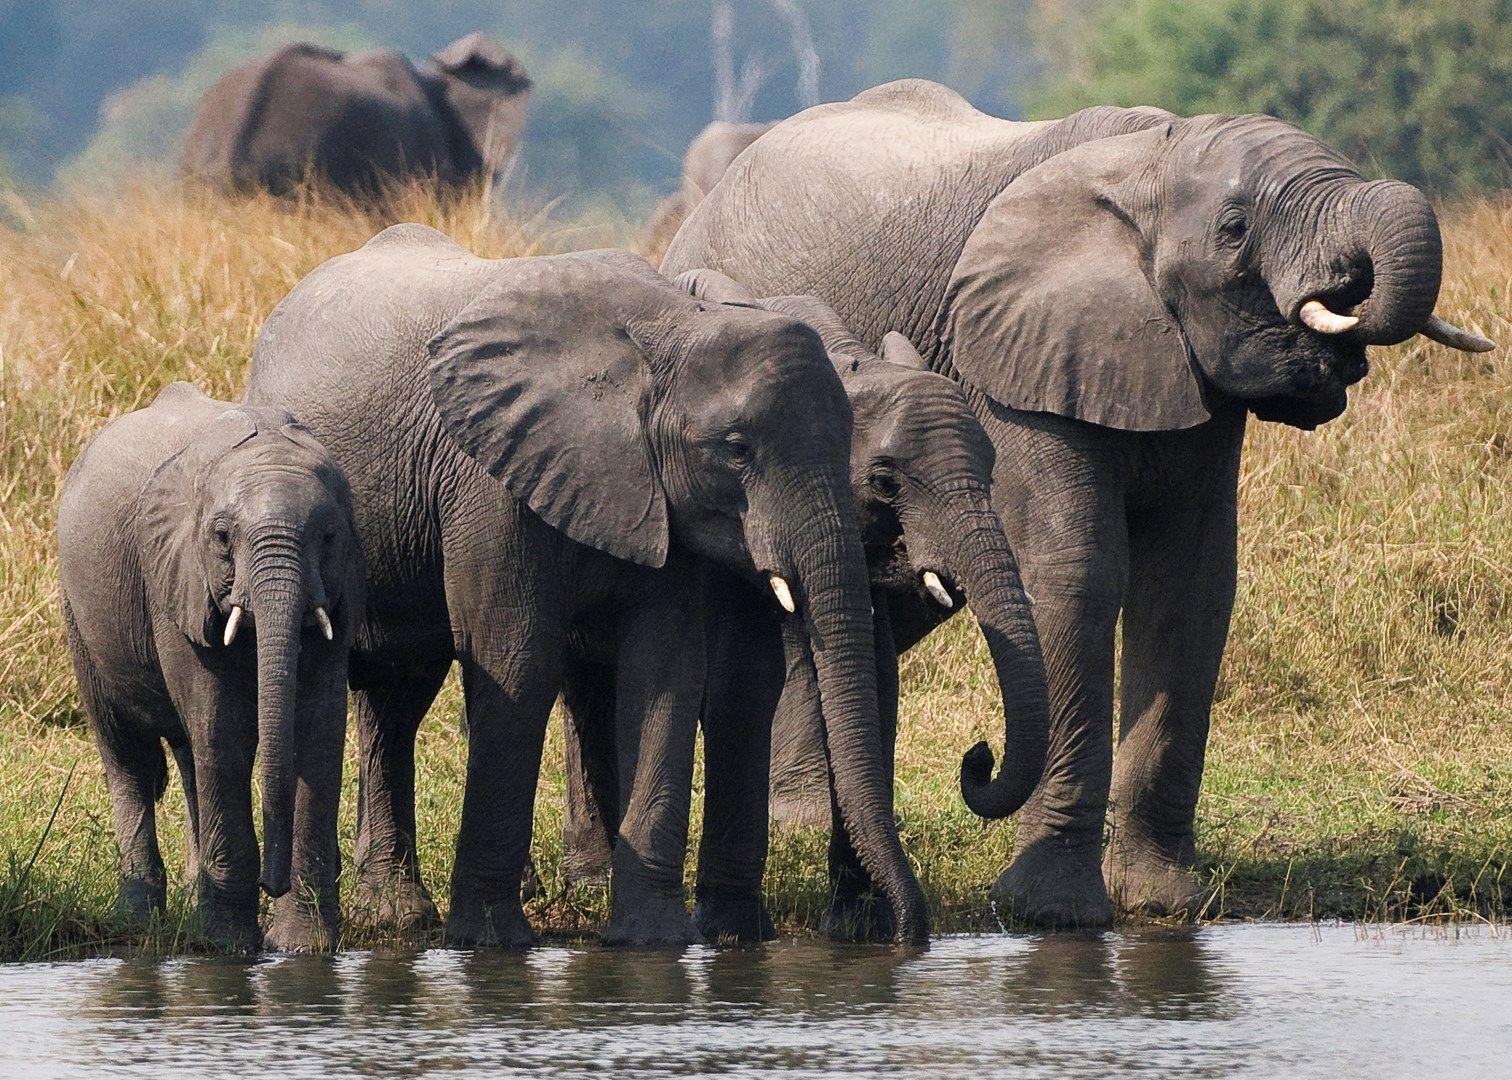 Malawi, Liwonde National Park